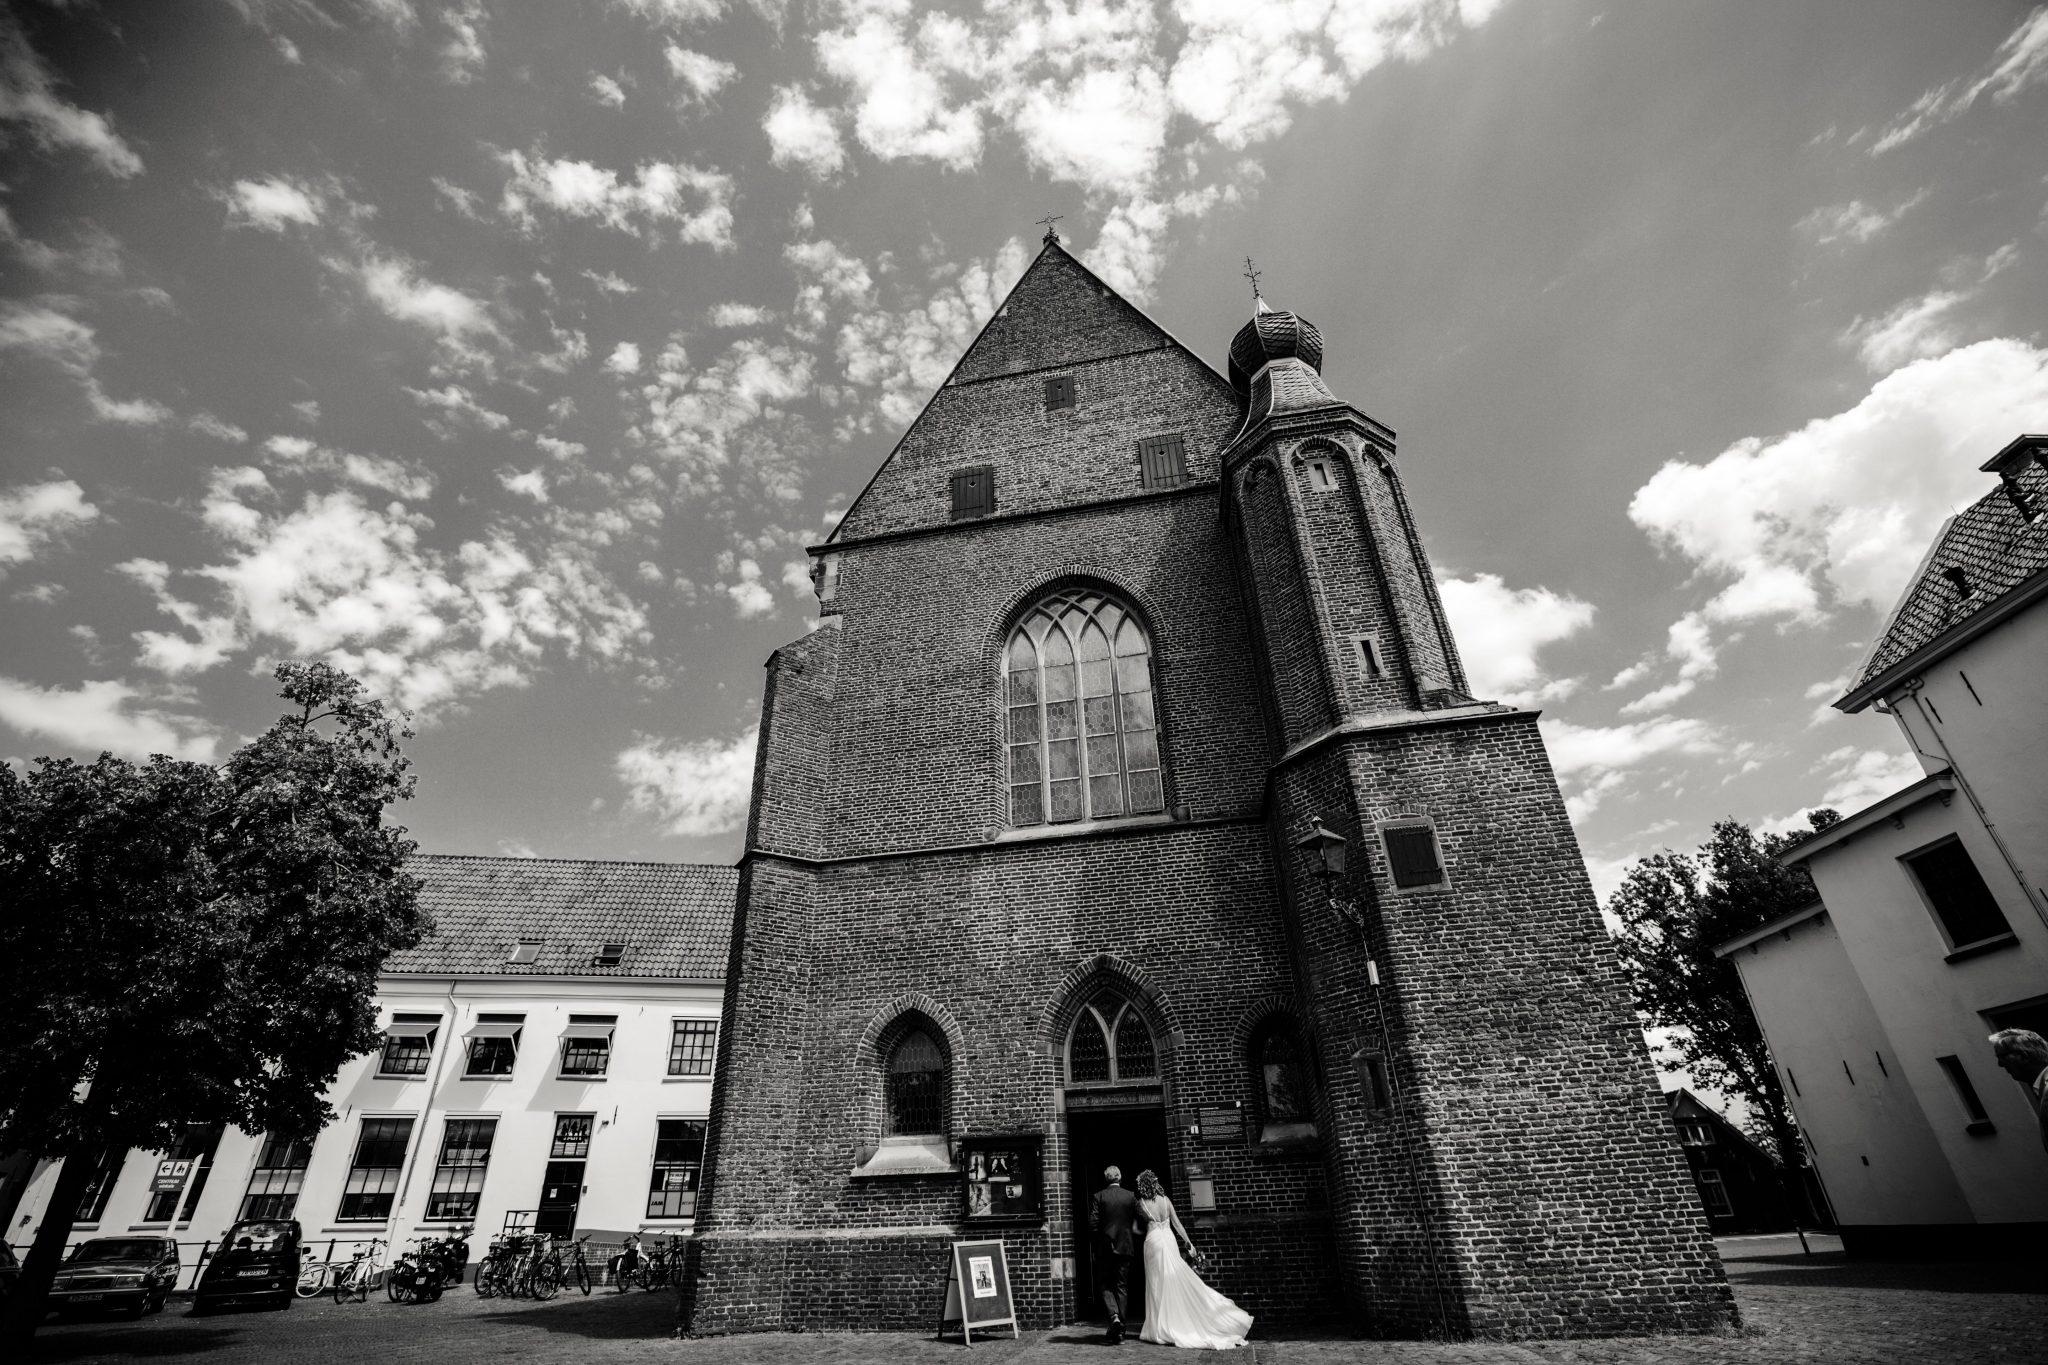 Bruiloft catharinakapel Harderwijk